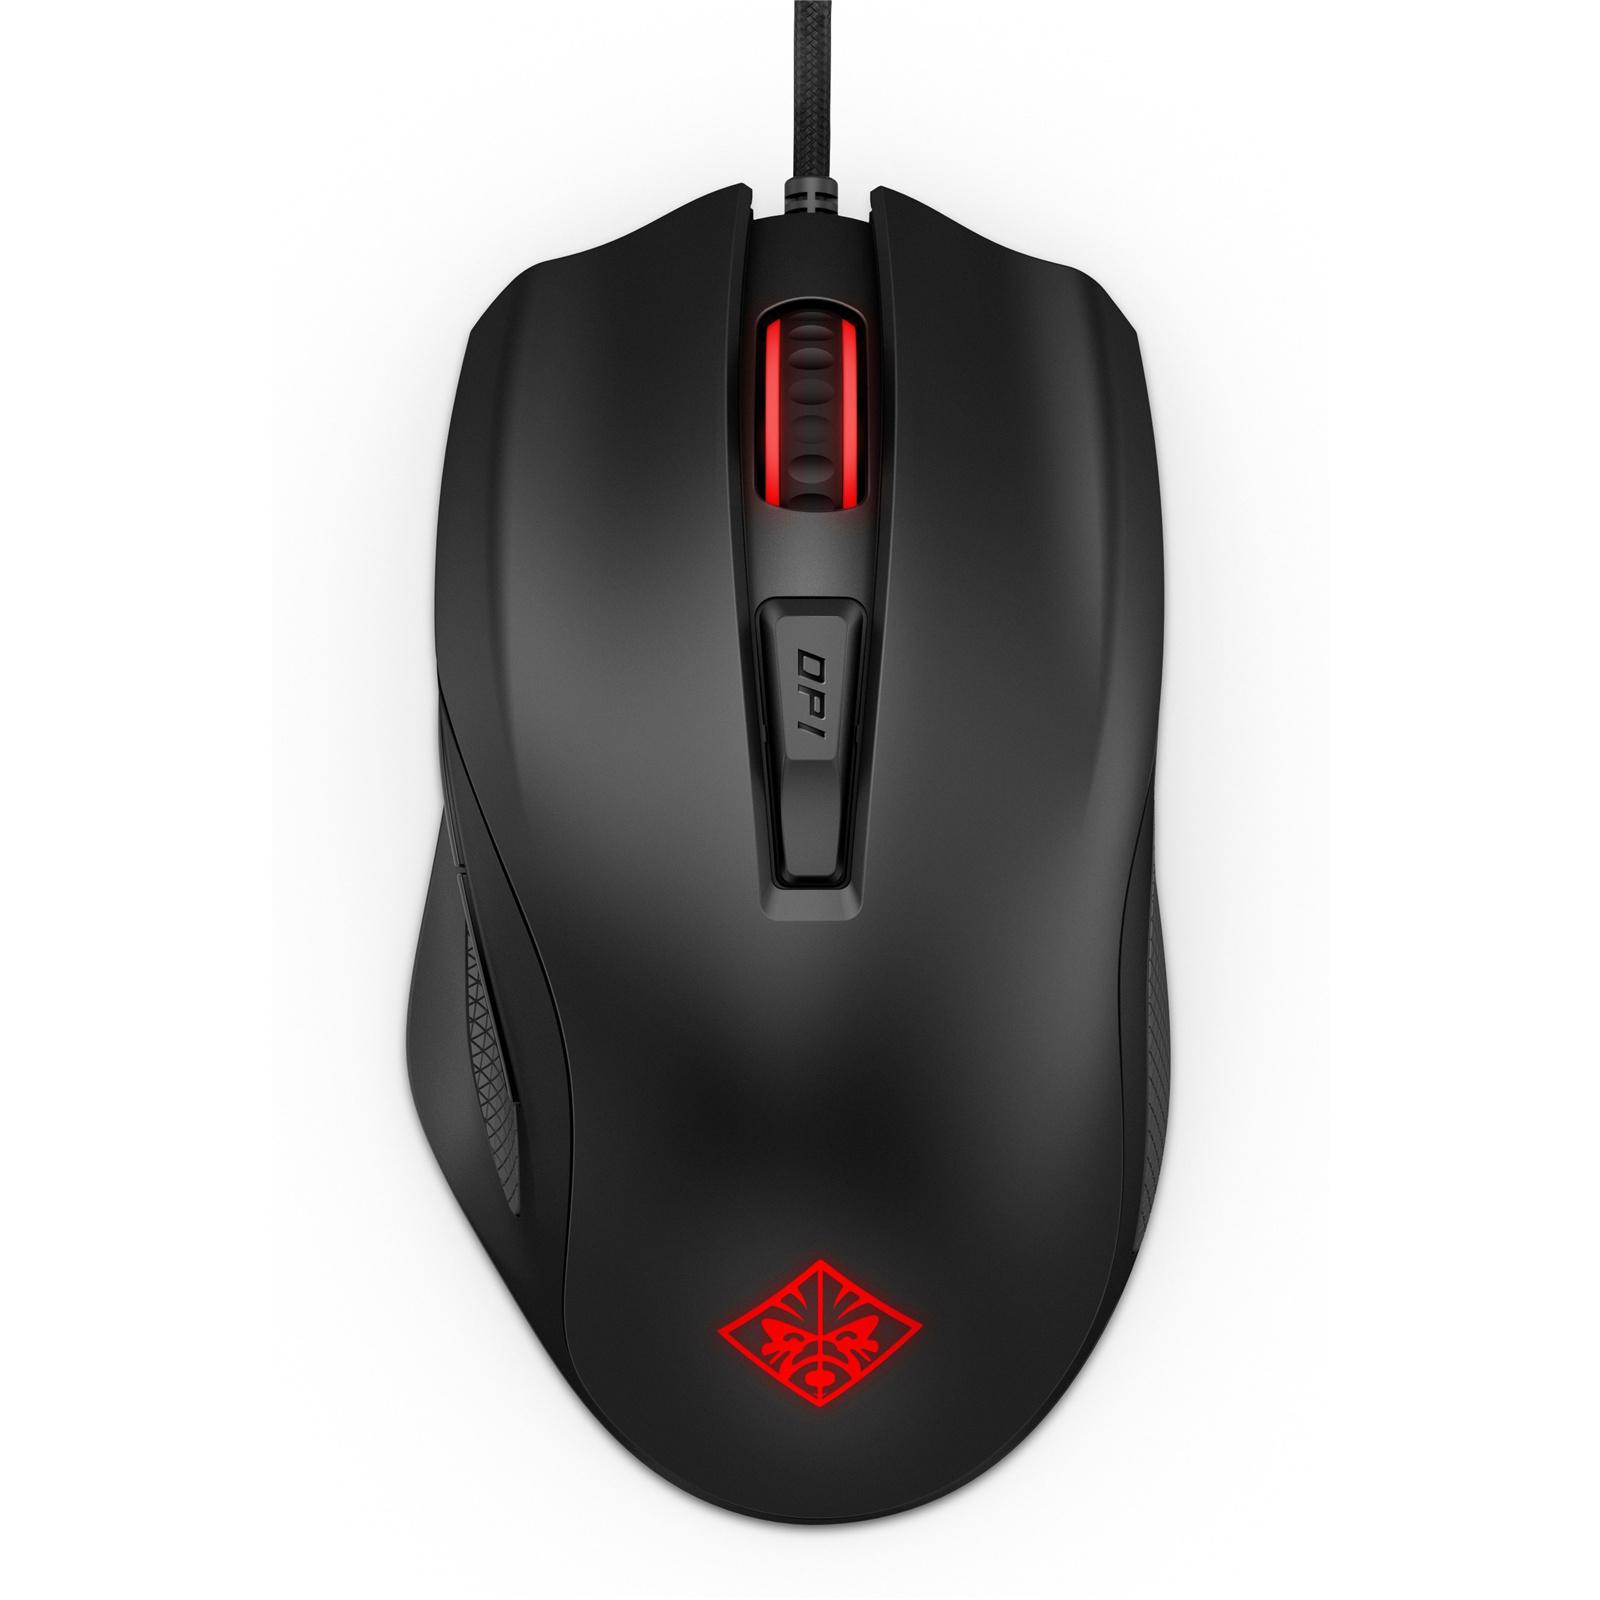 Buy the HP OMEN 600 Gaming Mouse Optical Sensor, 12000 dpi